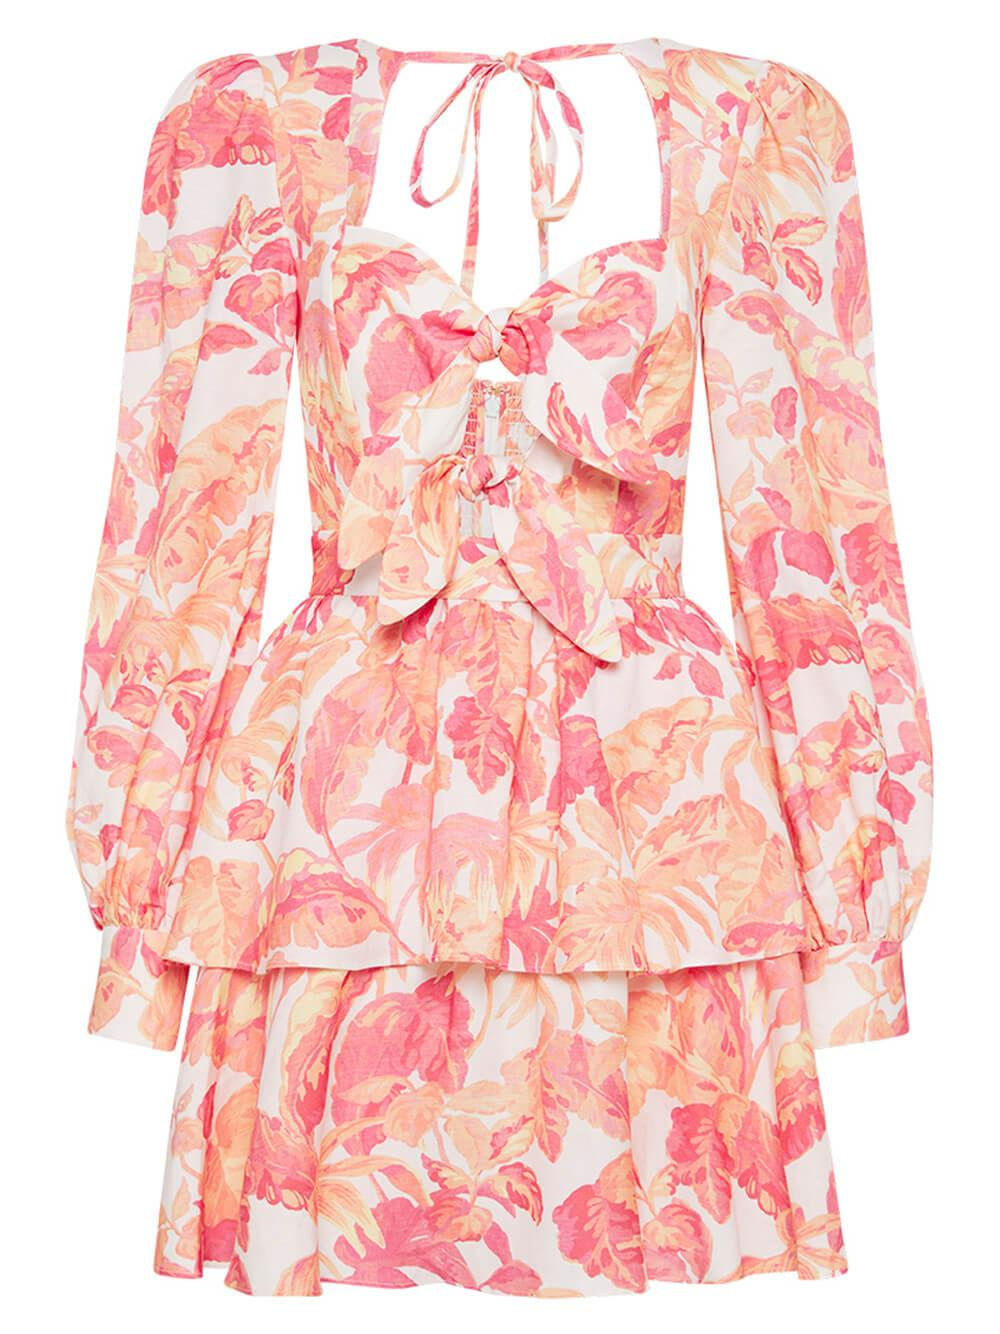 Tropicale Mini Dress Item # 2103-1079